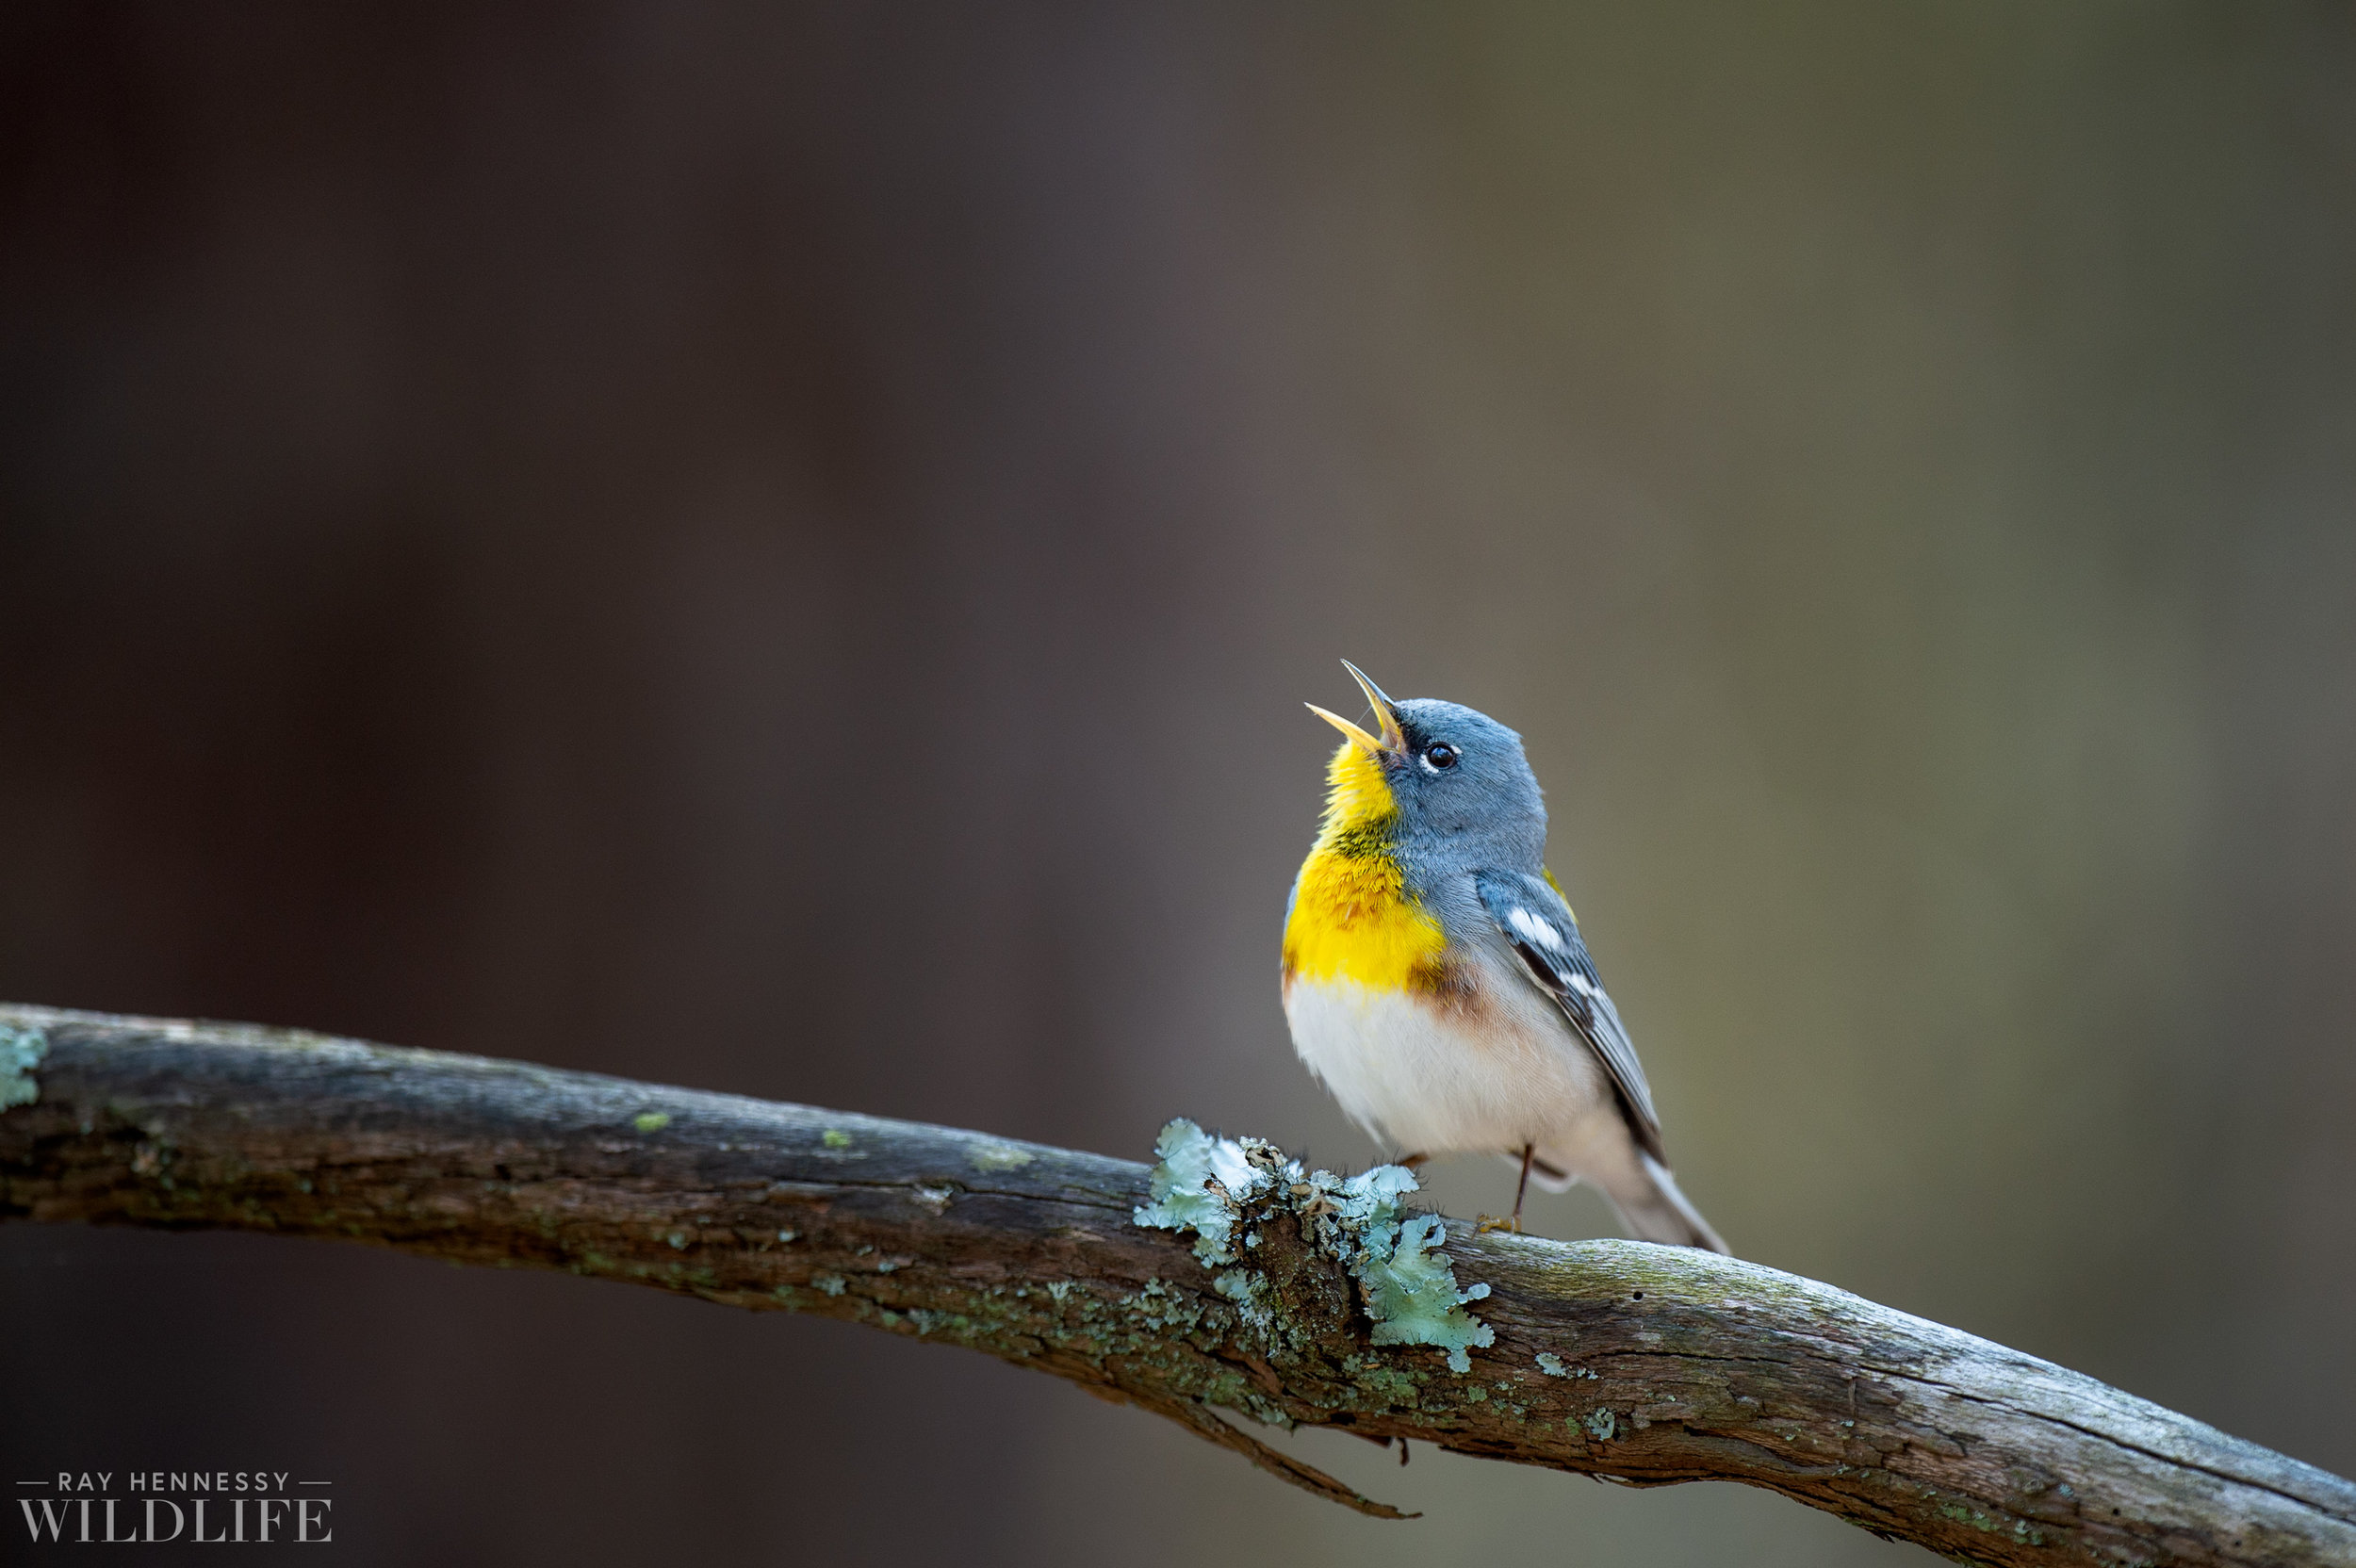 019_spring-warblers-new-jersey.jpg